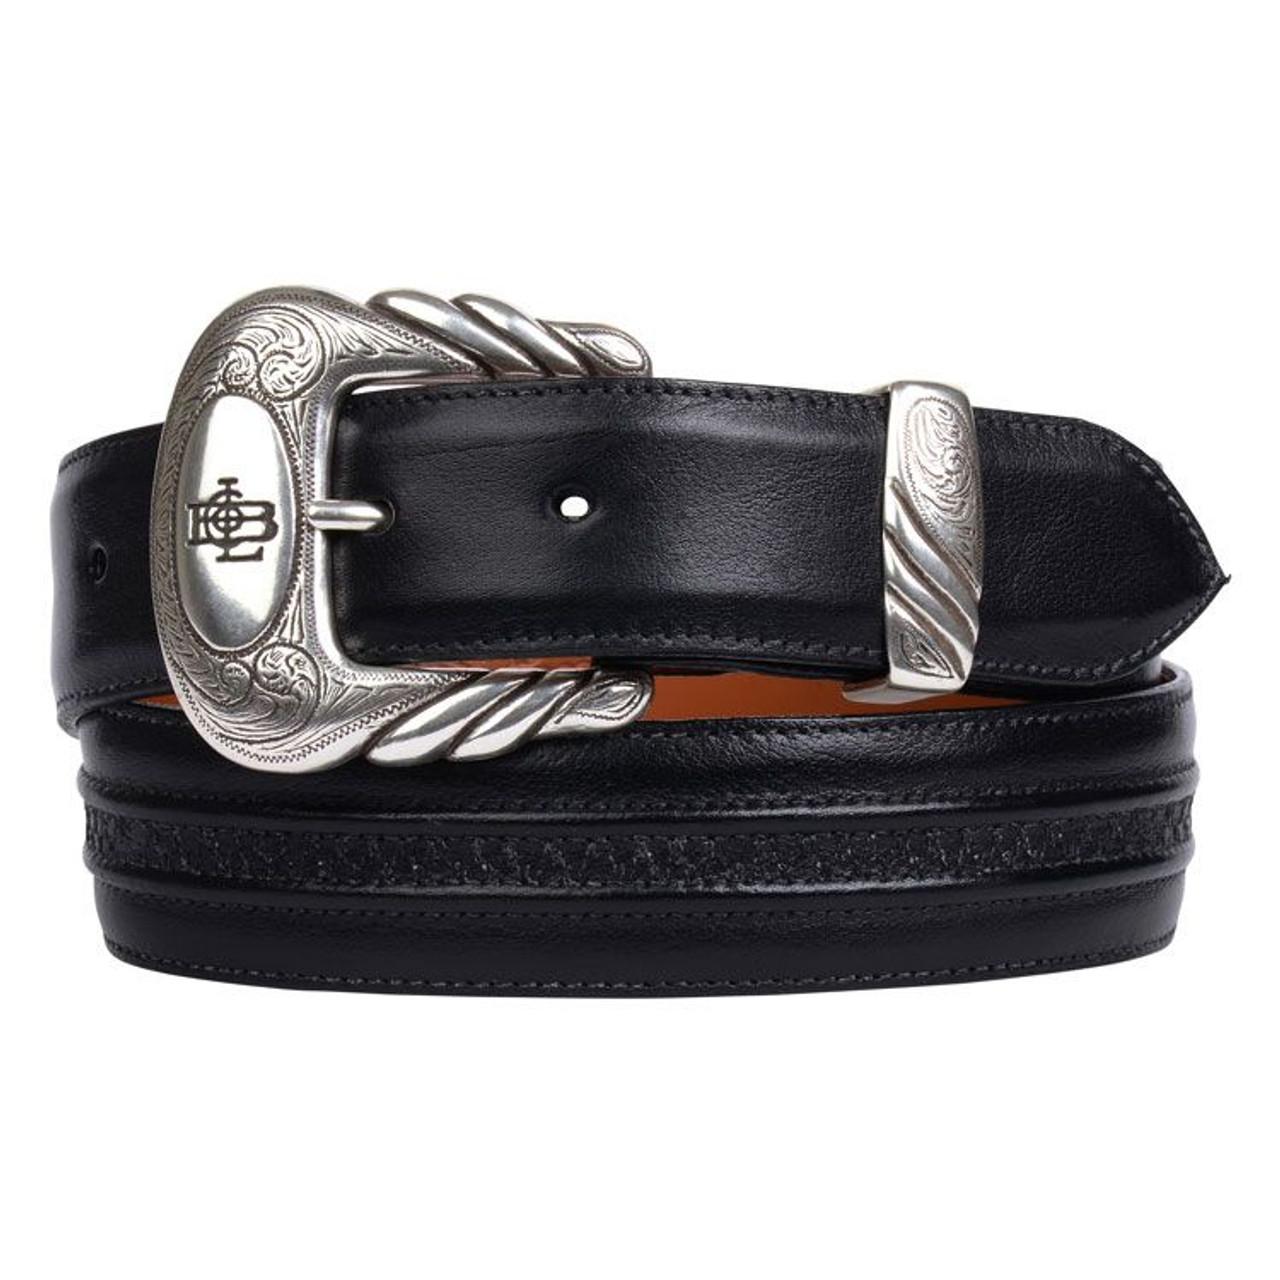 Ariat Men/'s Classic Smooth Black Leather Belt